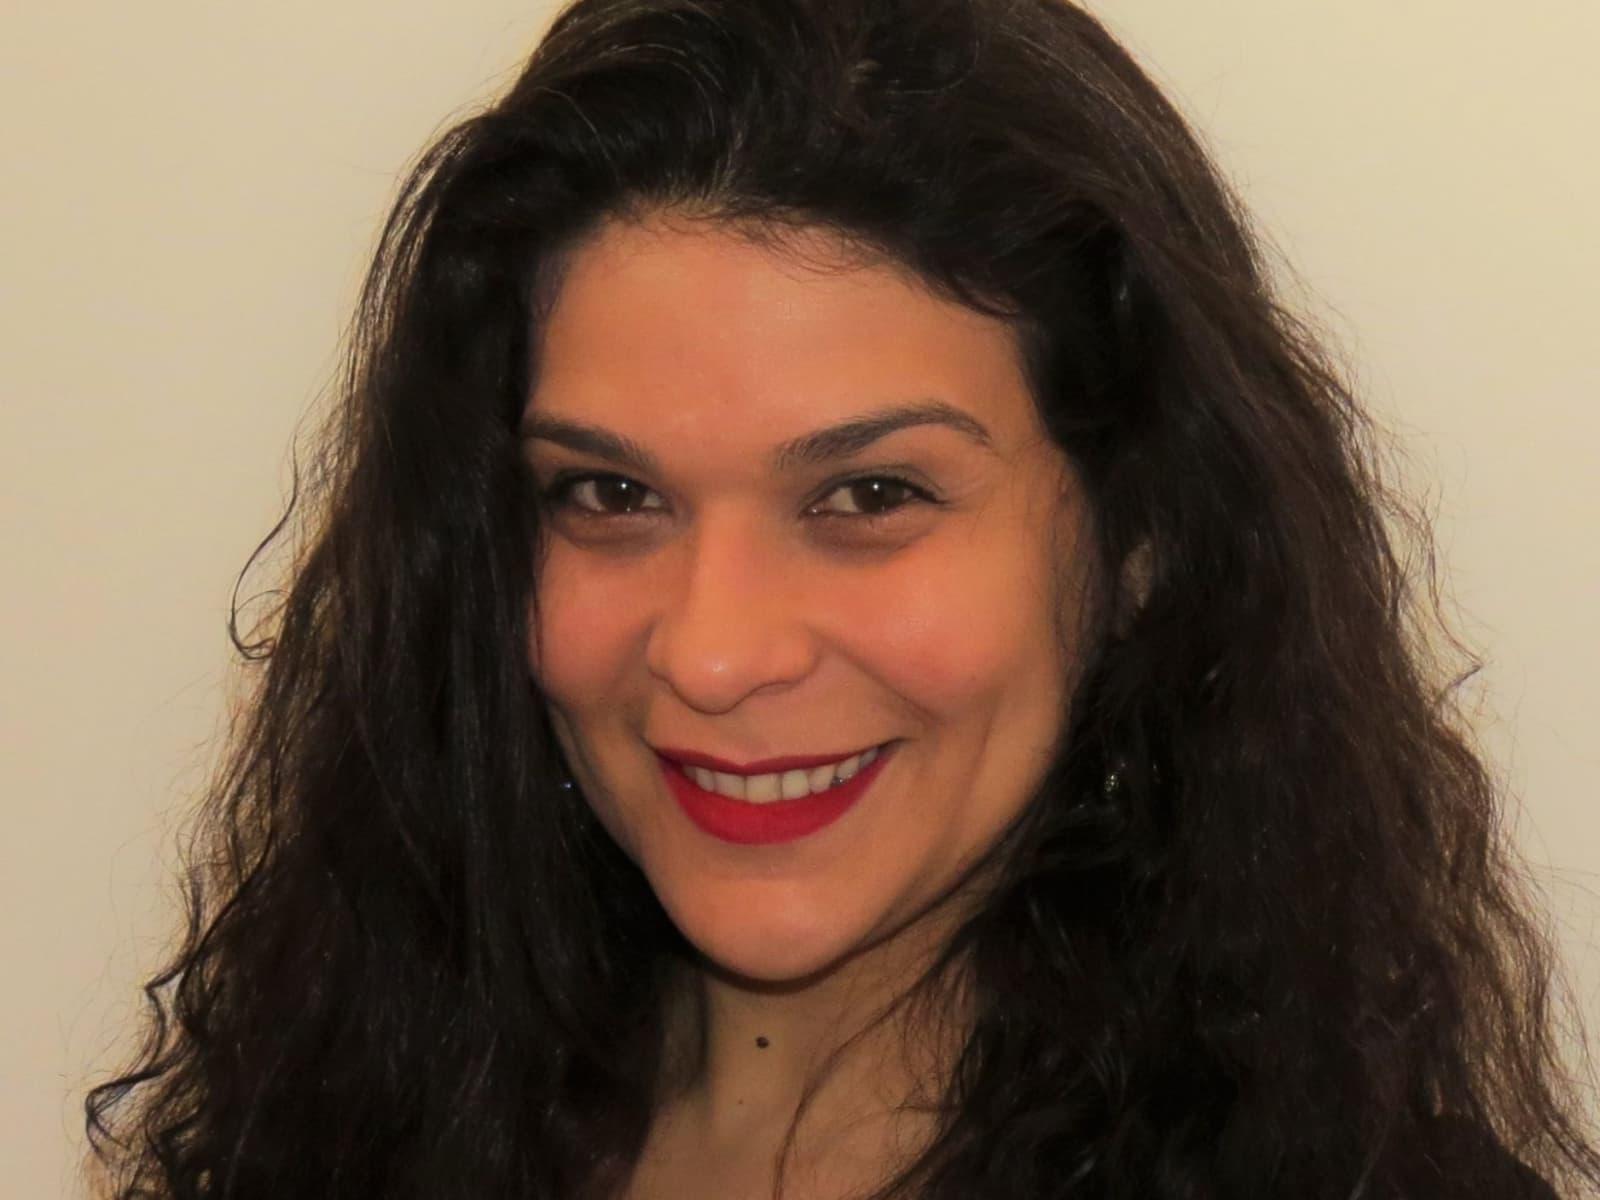 Sergia from London, United Kingdom